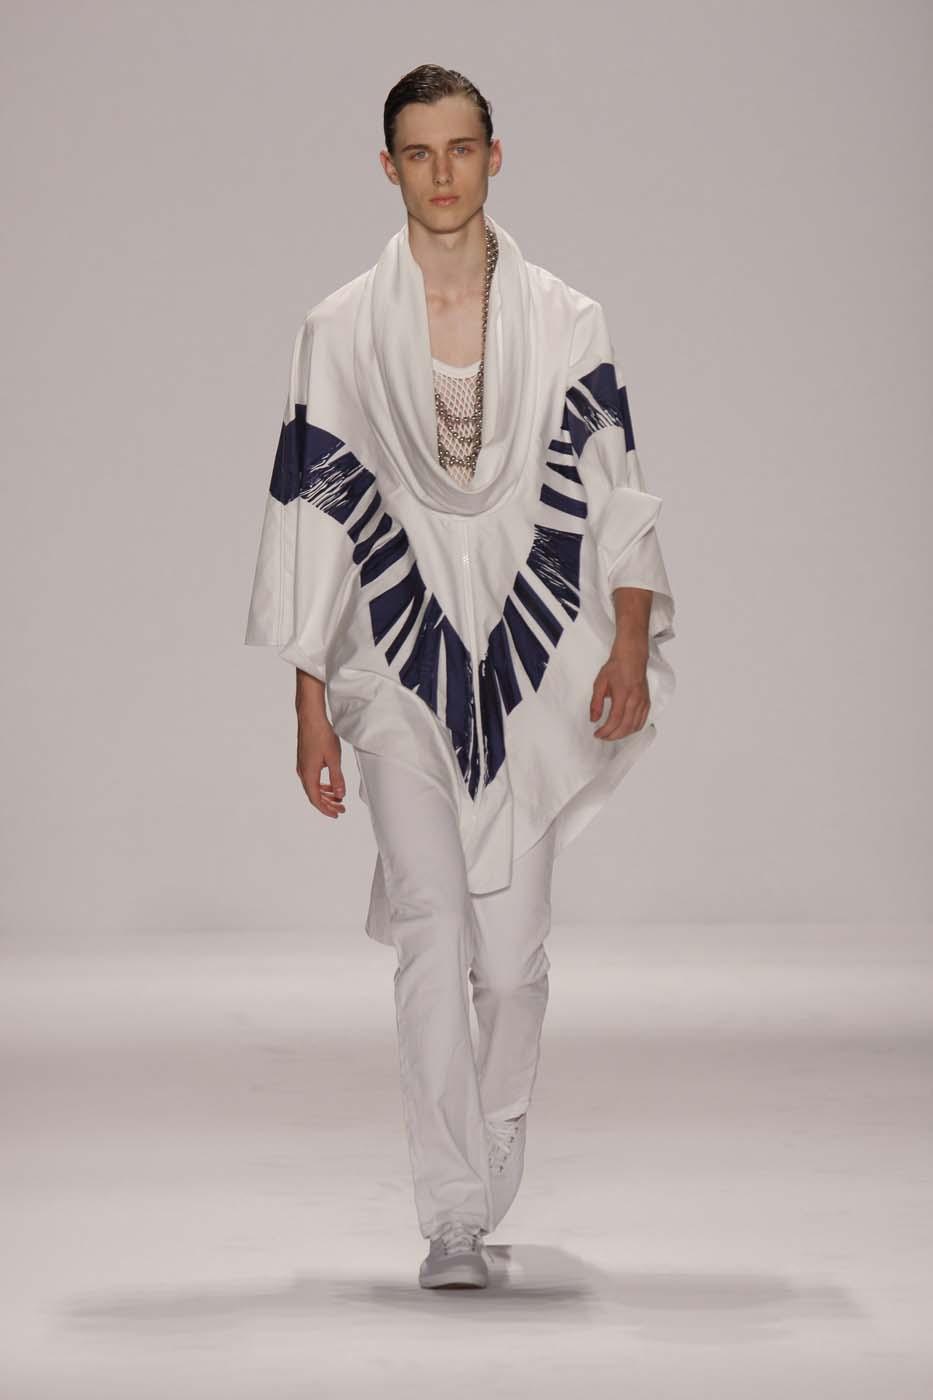 Ryu Designer Clothing | New York Fashion Week September 2008 Jaime Cole Menswear And